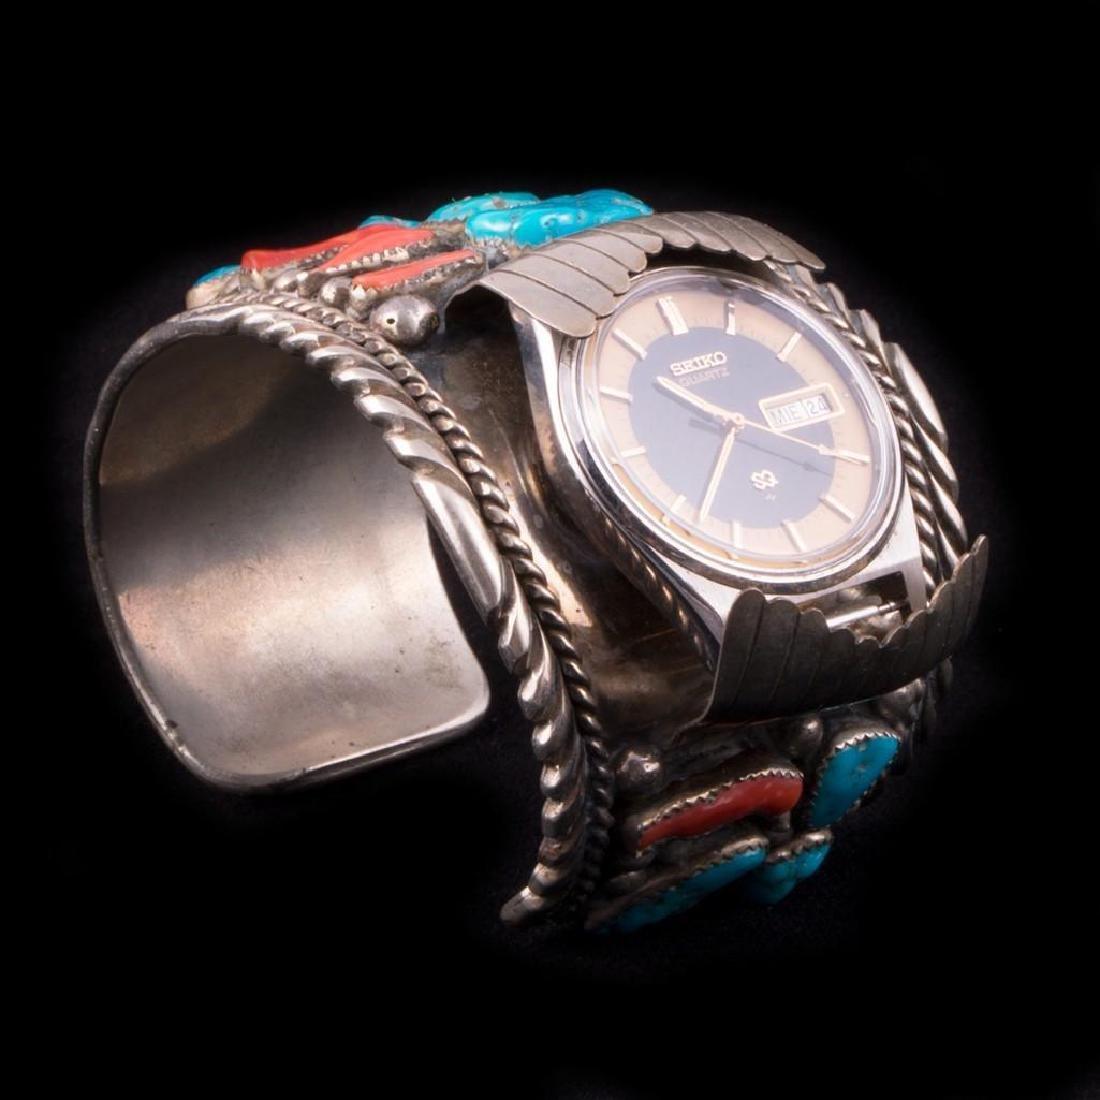 Navajo Watch Cuff